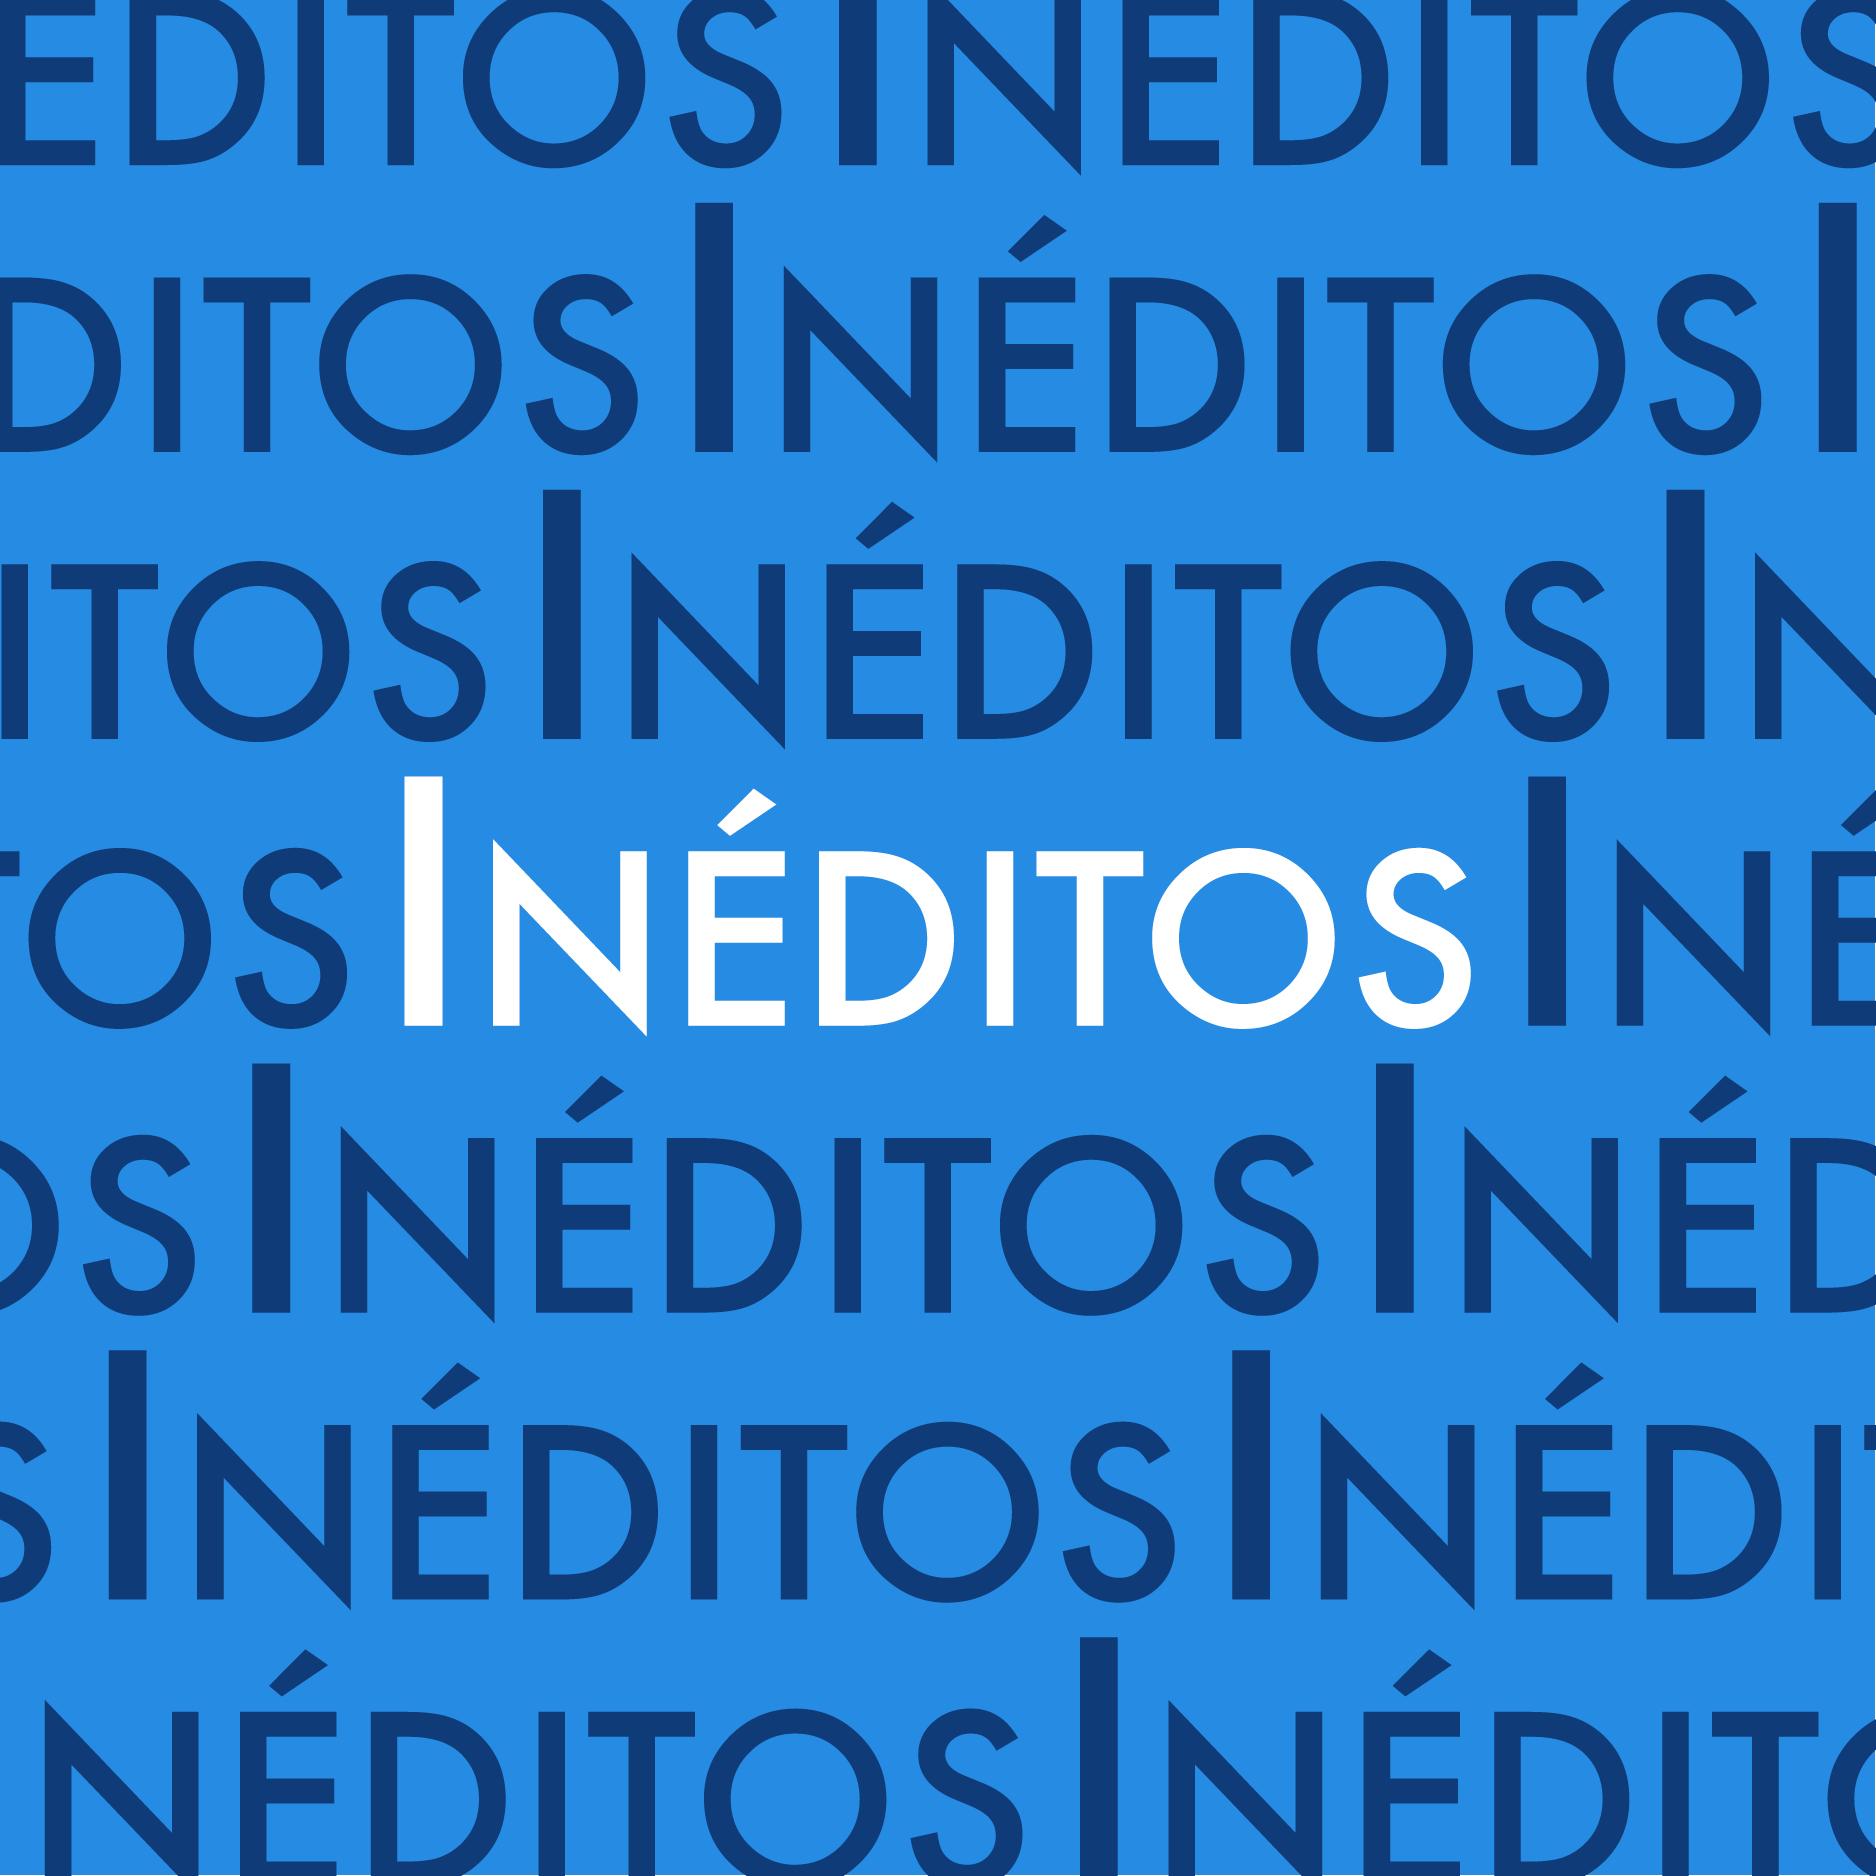 INEDITOS.jpg